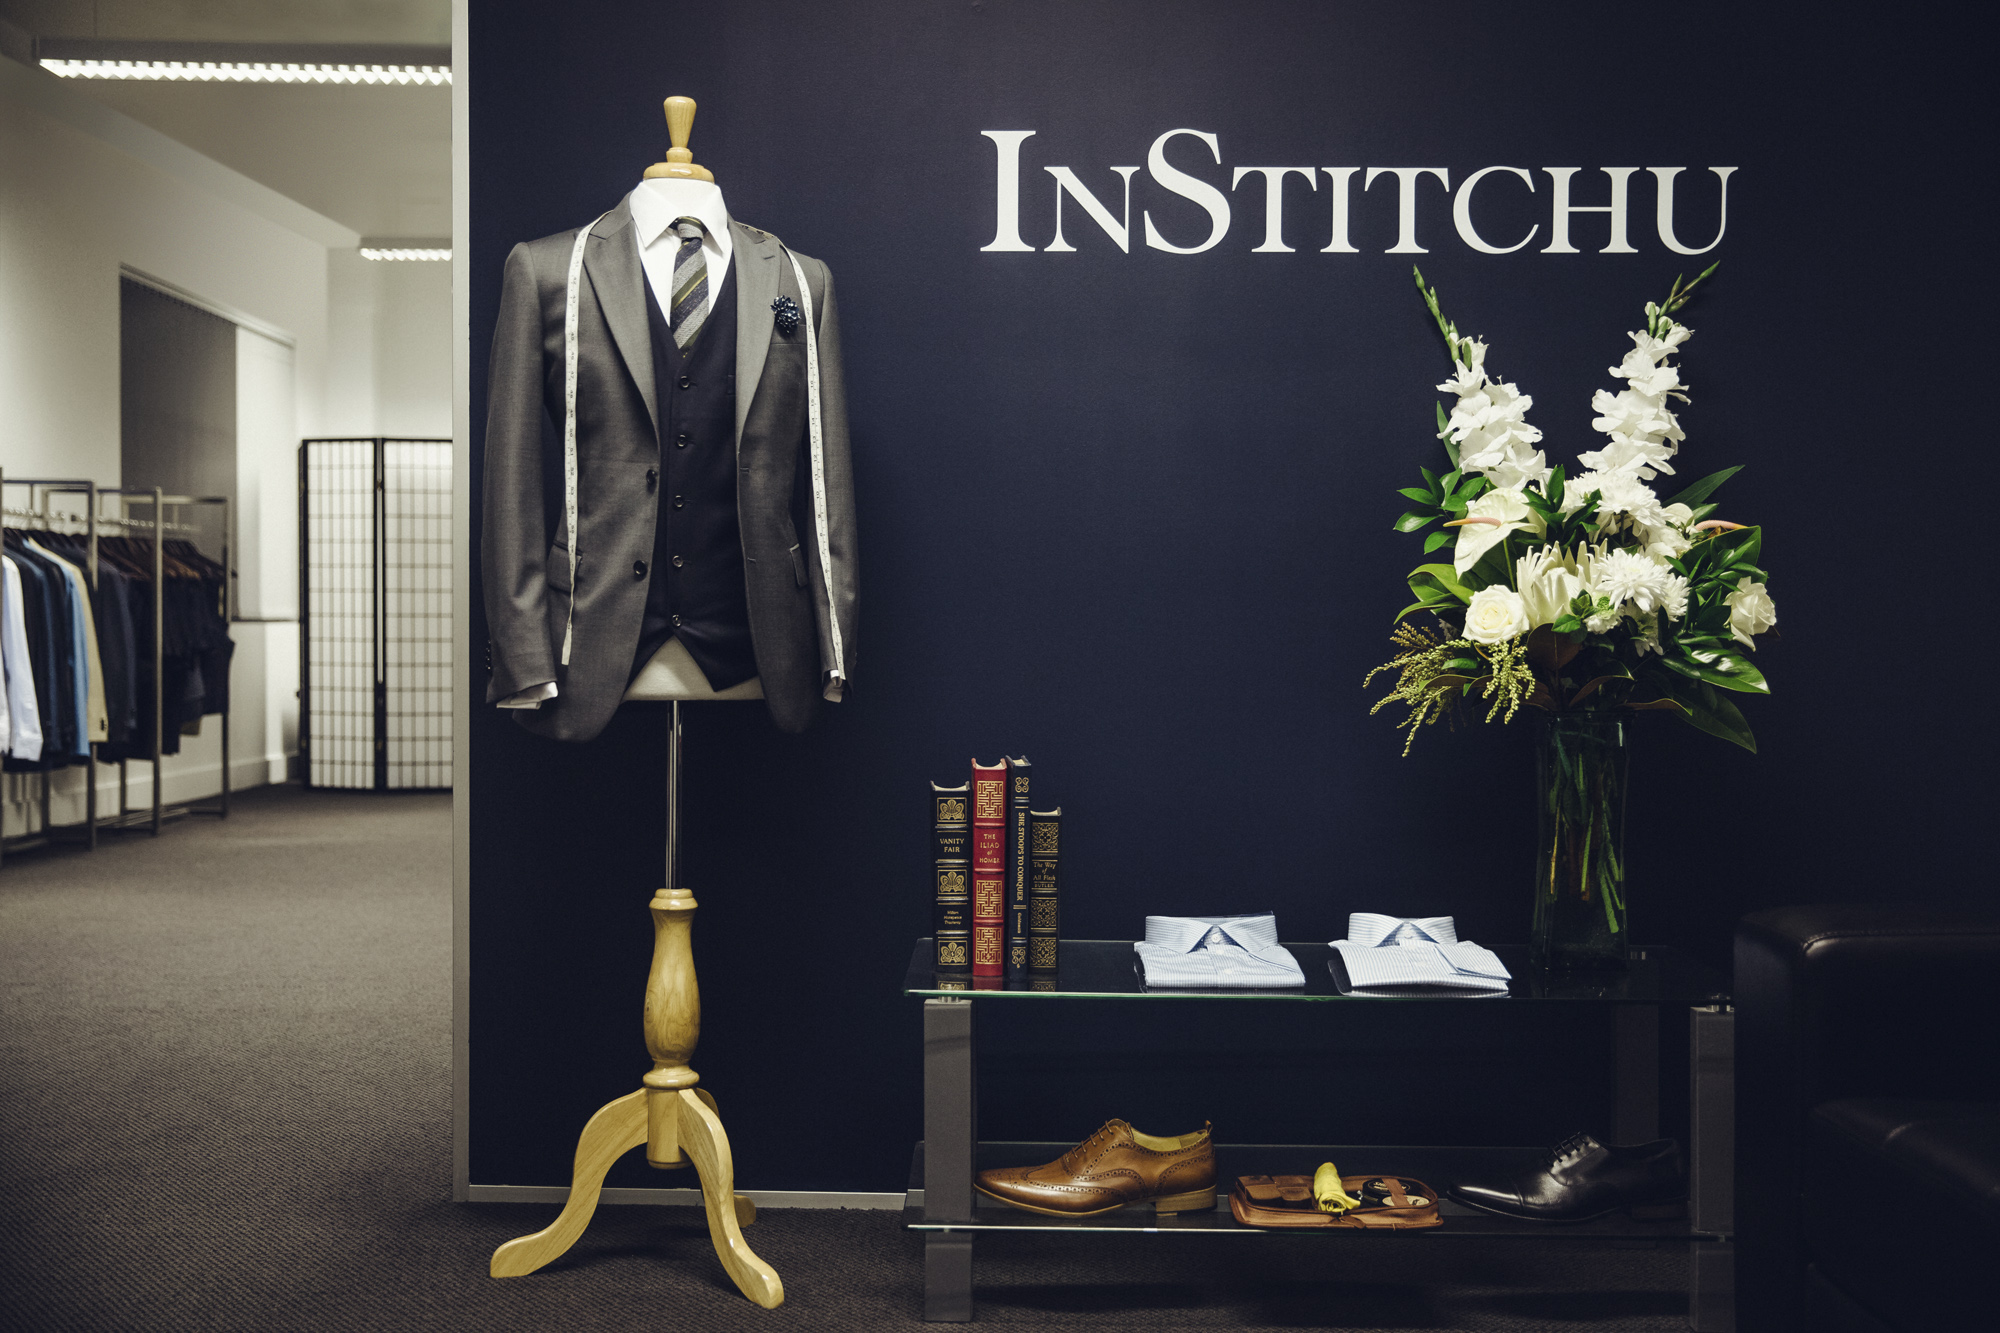 institchu-8